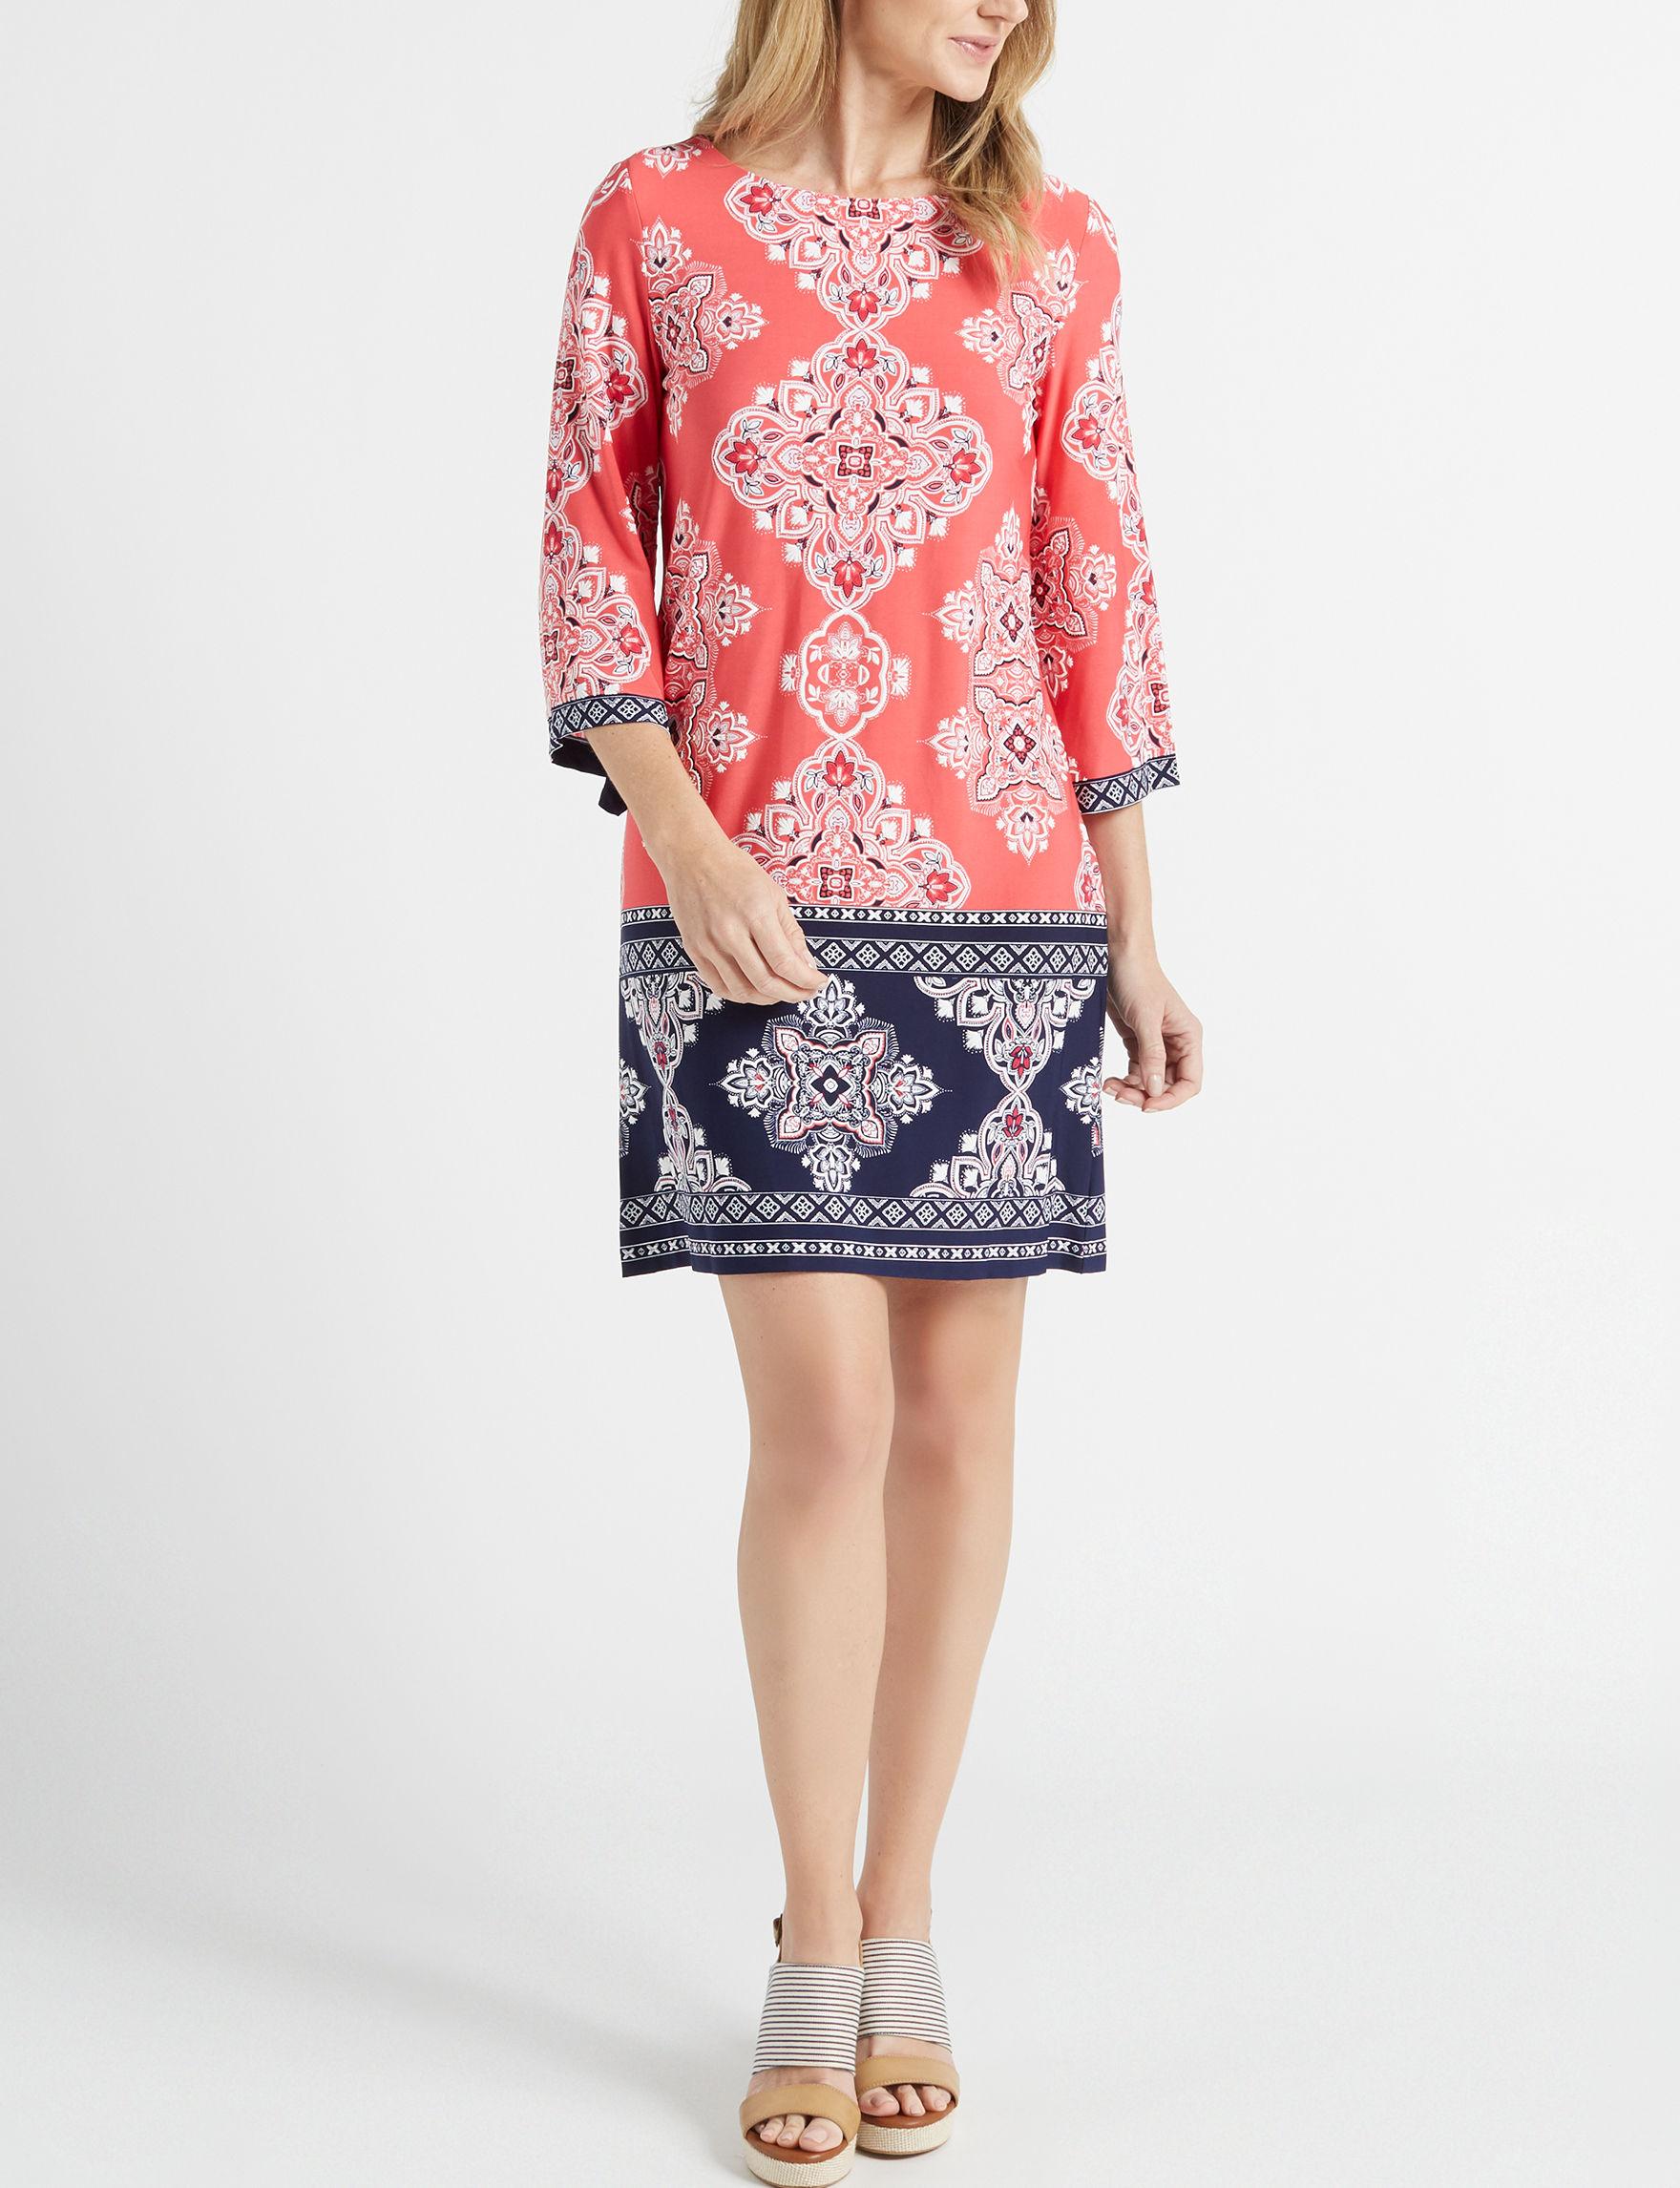 Sandra Darren Red / Multi Everyday & Casual Shift Dresses